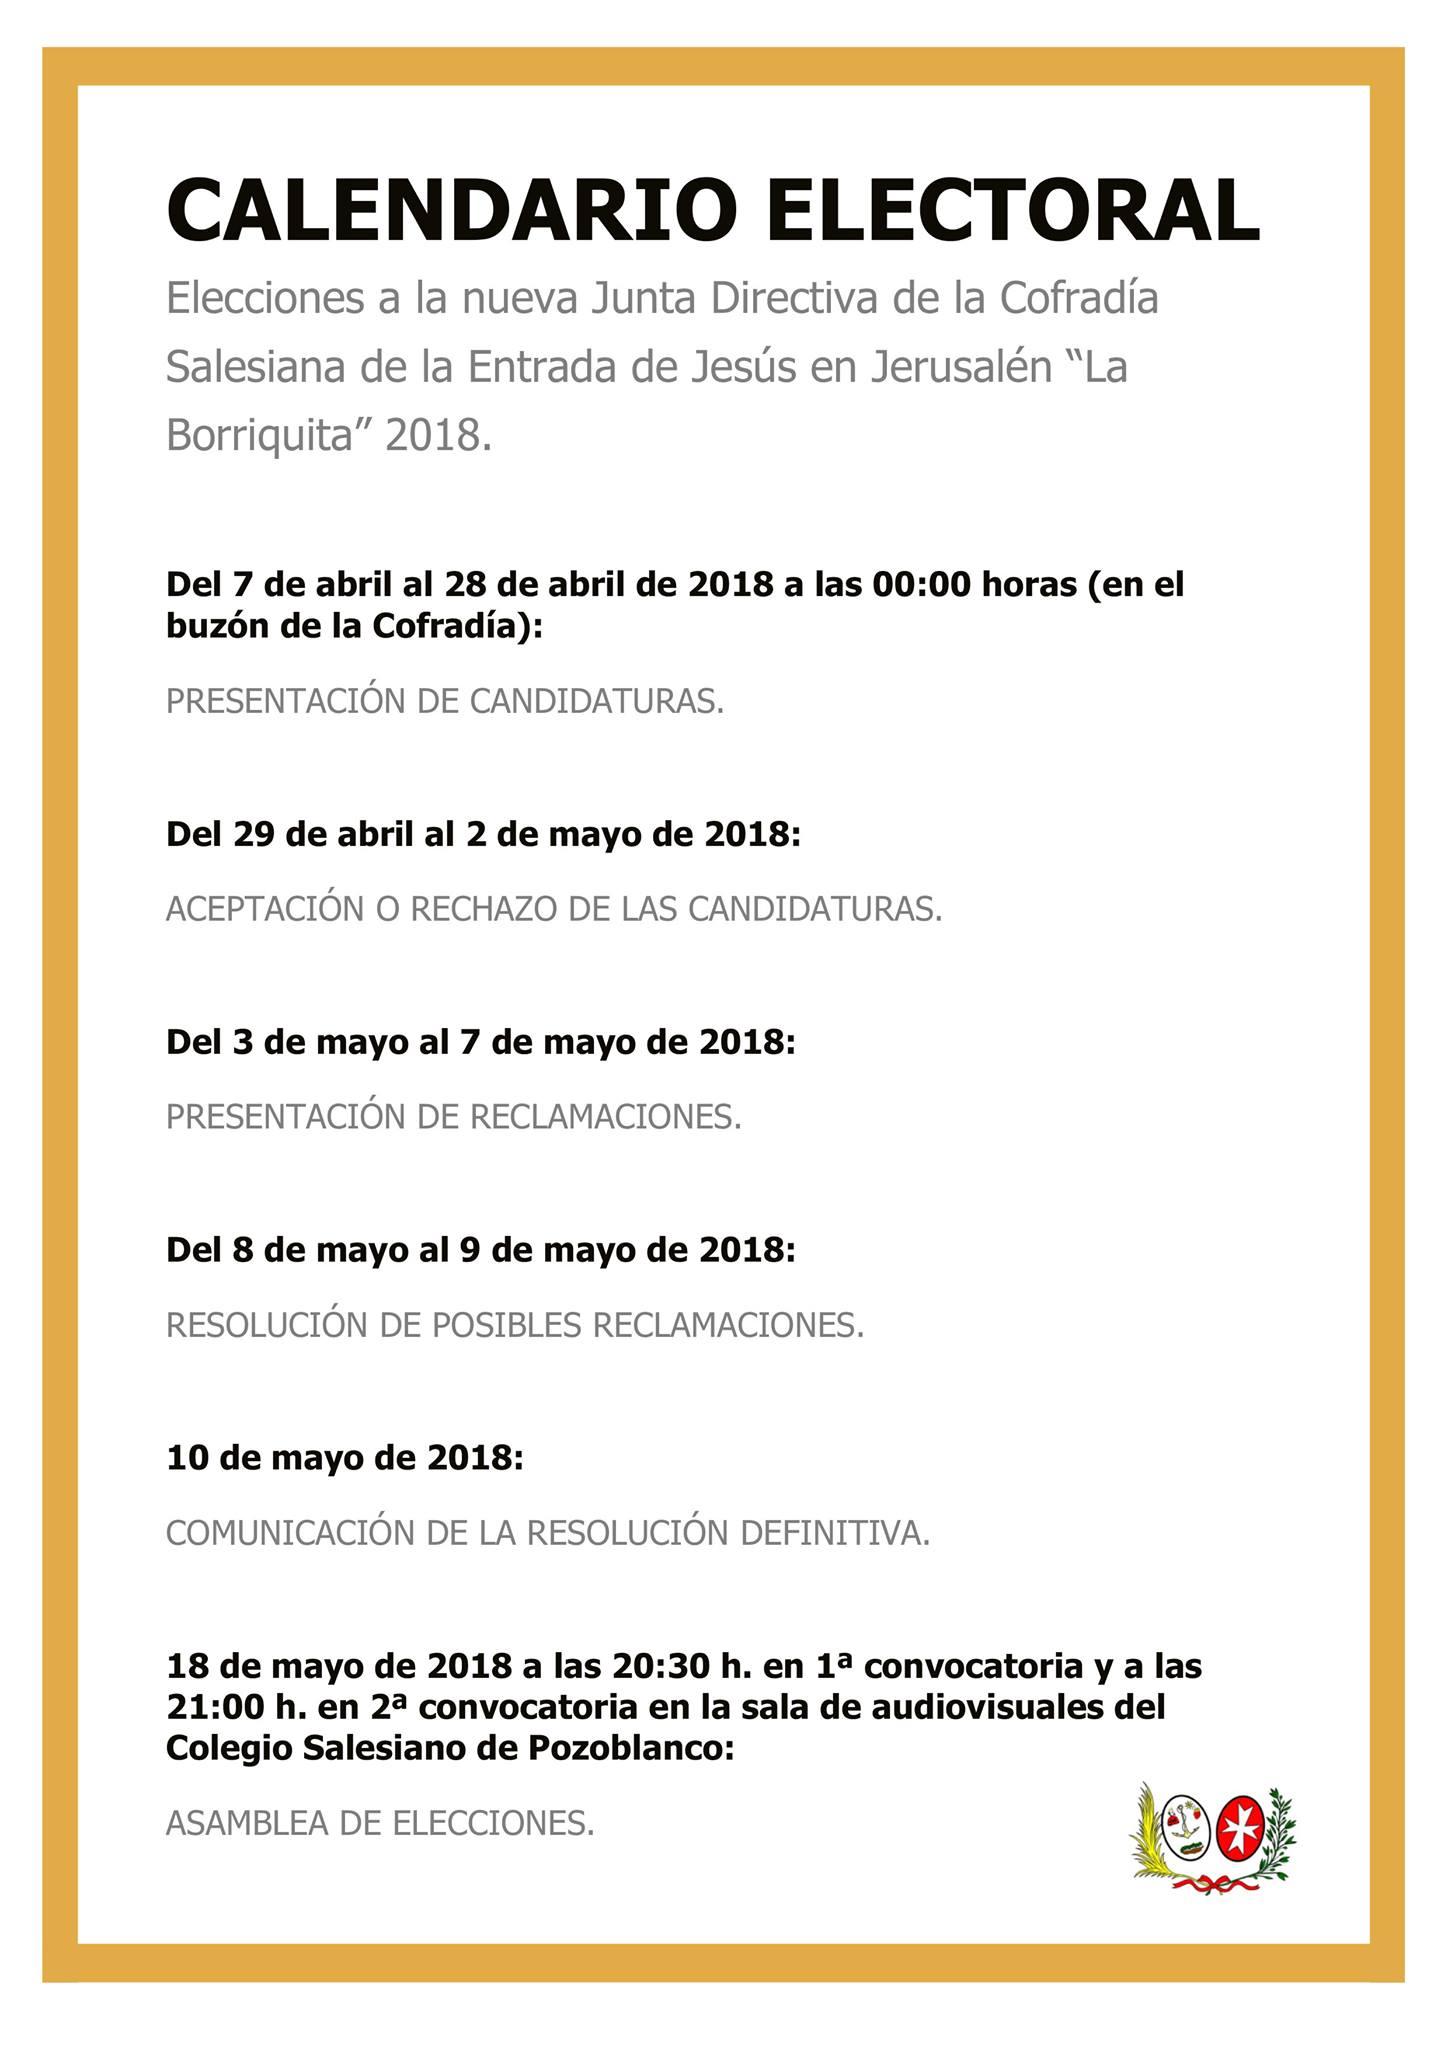 Calendario Electoral La Borriquita 2018